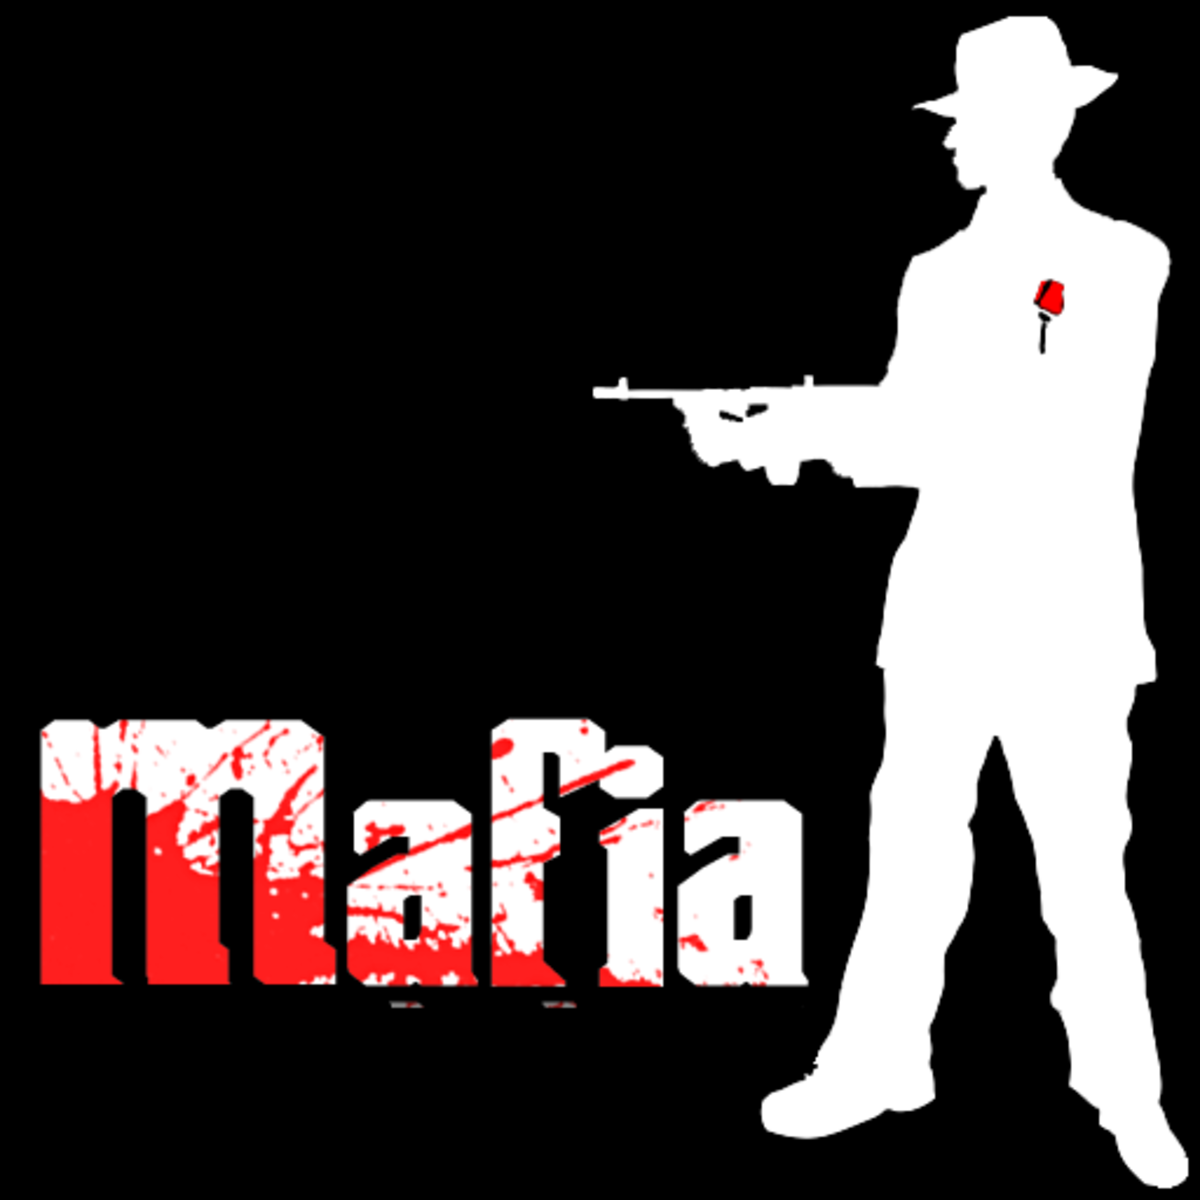 Learn how to play Mafia